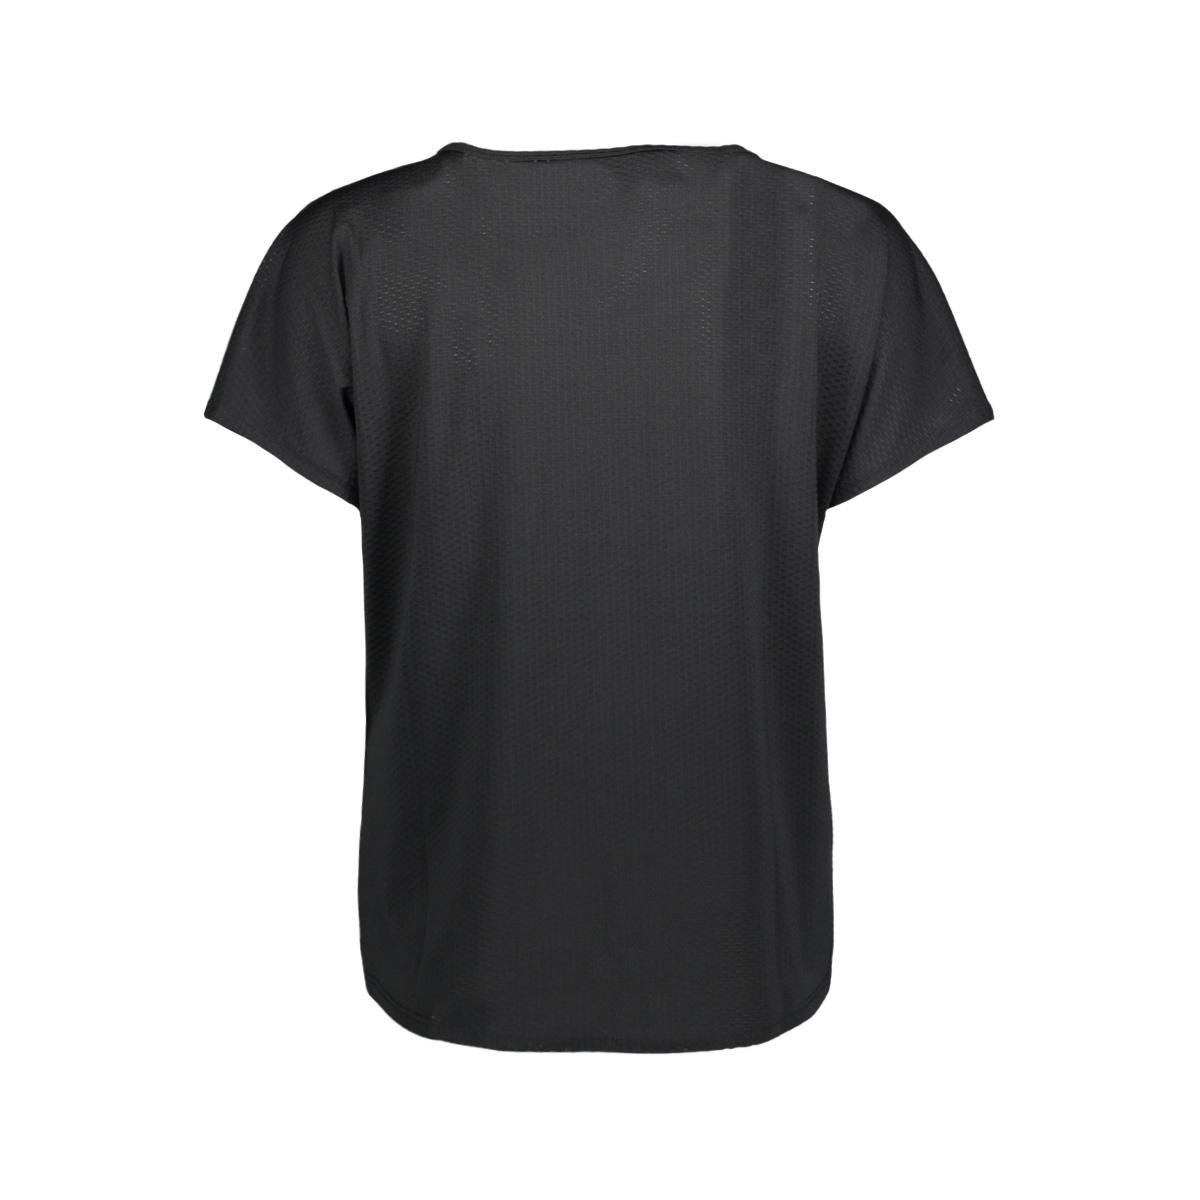 onpvineda short training tee prs 15139517 only play sport shirt black/ tornado